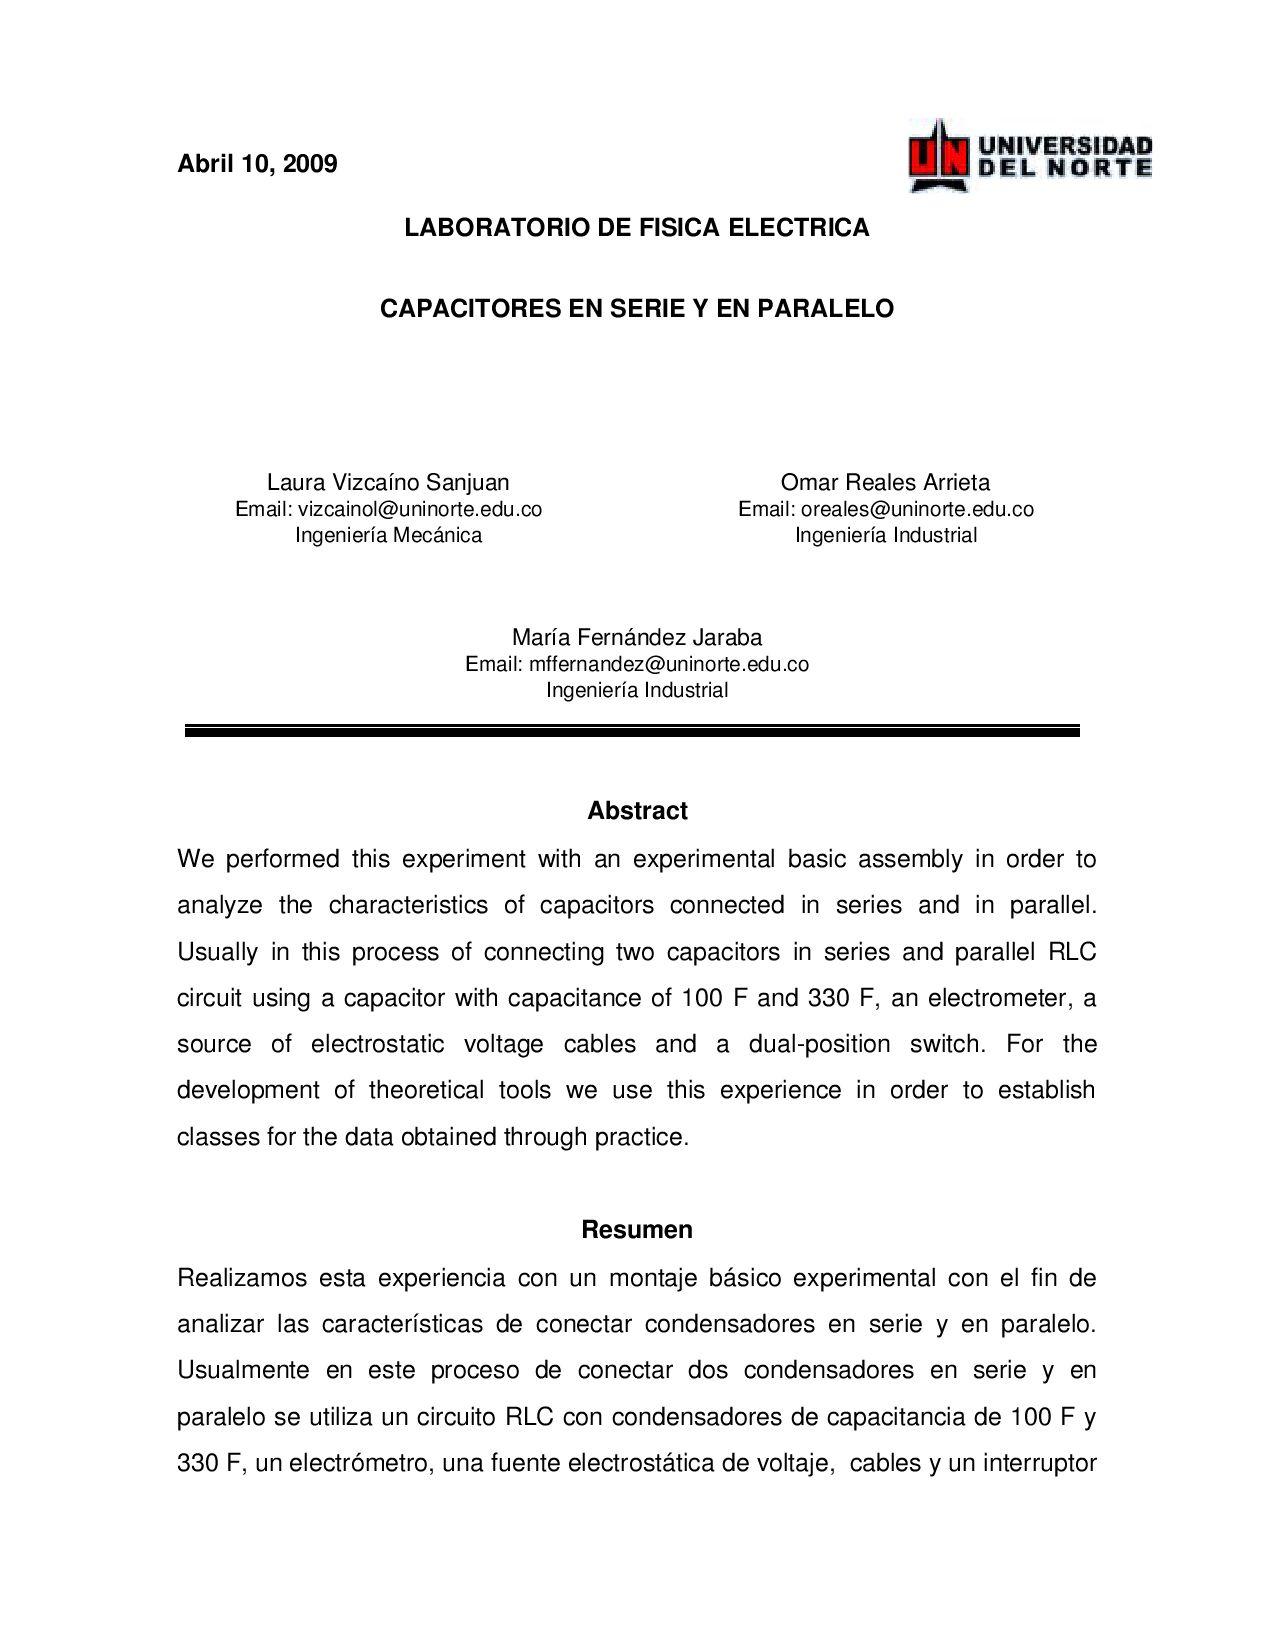 Circuito Seri E Paralelo : Informe capacitores en serie y paralelo by omar reales issuu